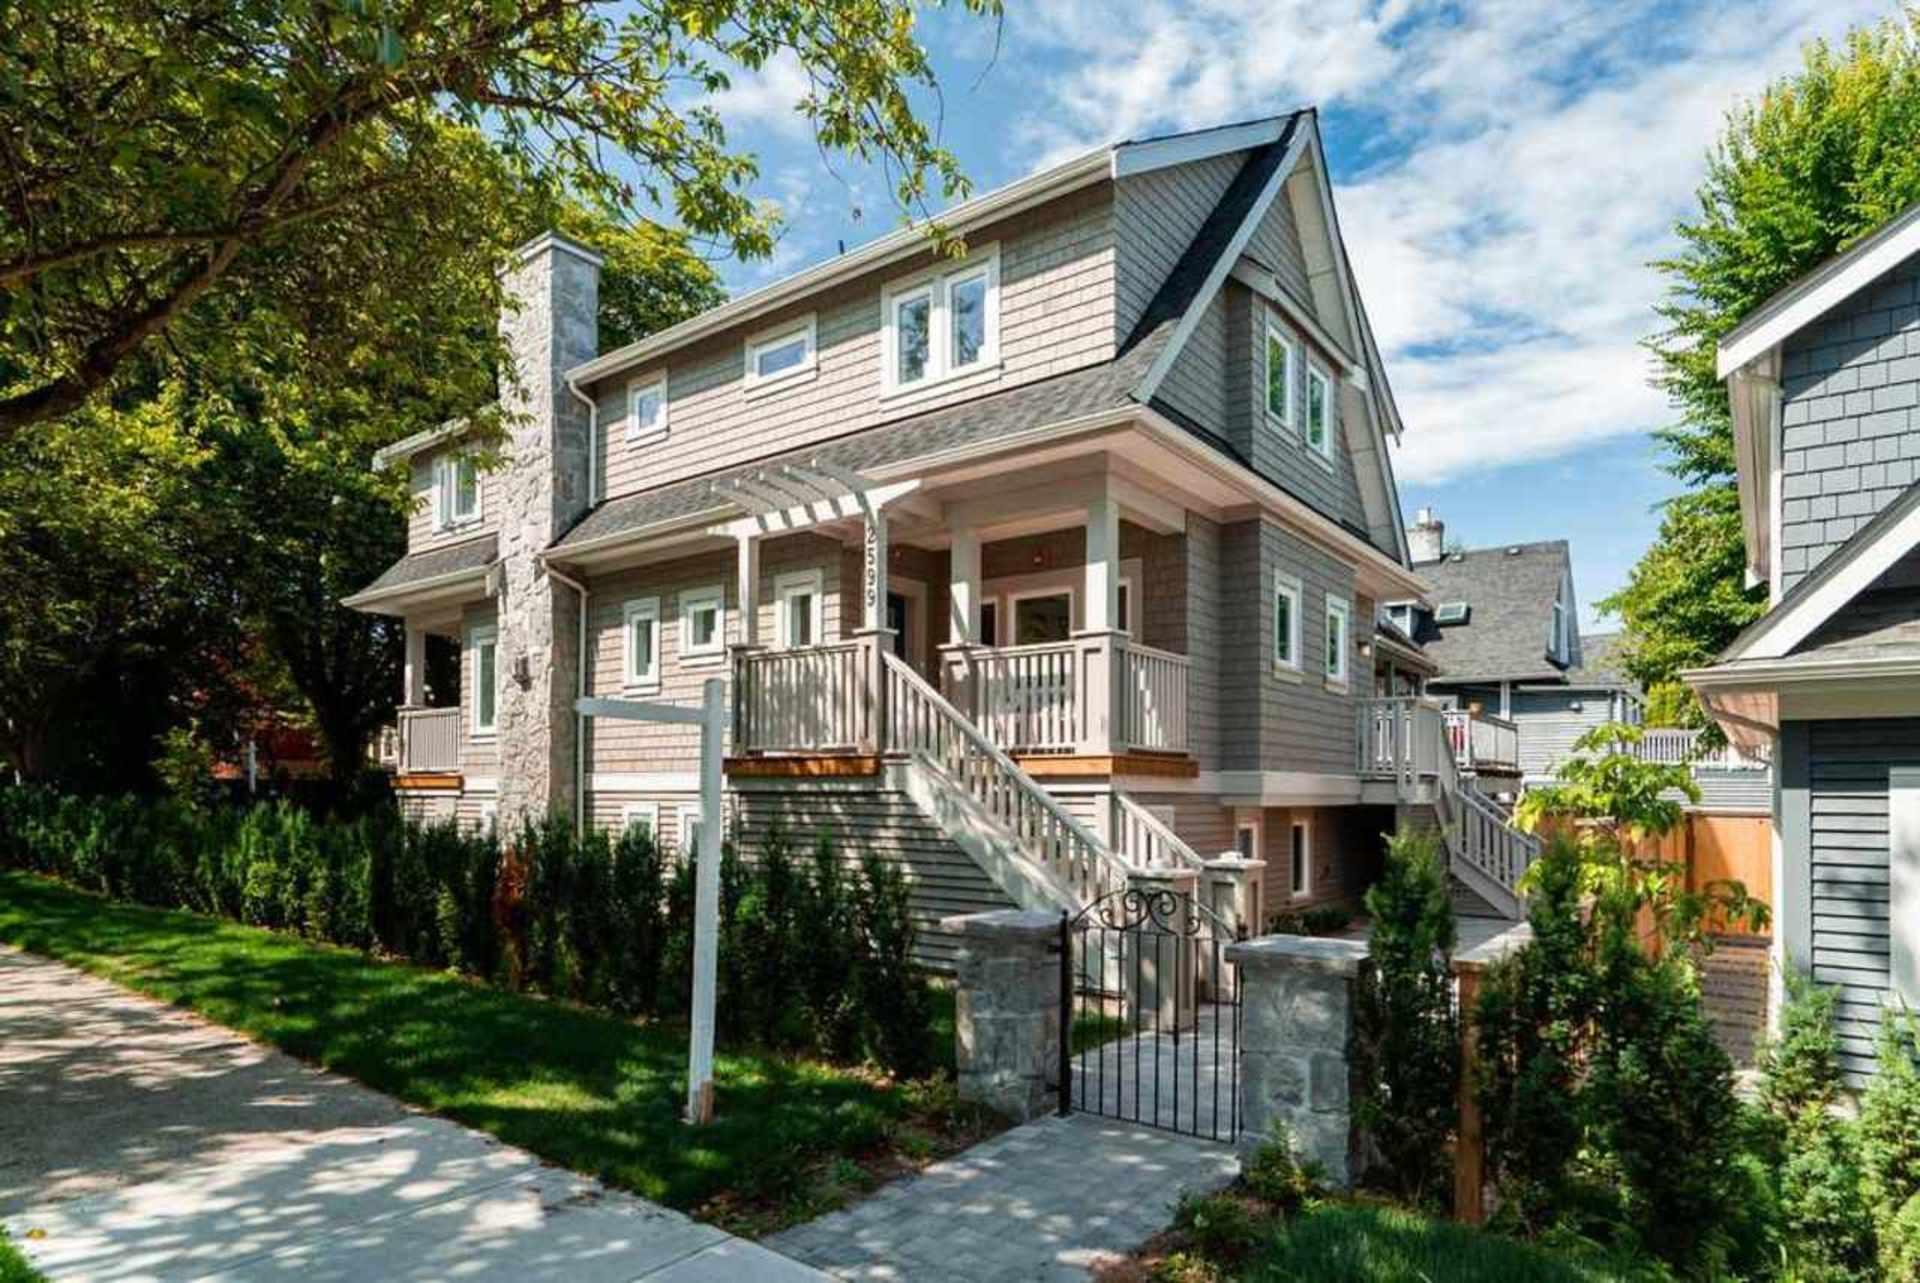 2599-stgeorge-street-mount-pleasant-ve-vancouver-east-02 at 2599 St.george Street, Mount Pleasant VE, Vancouver East